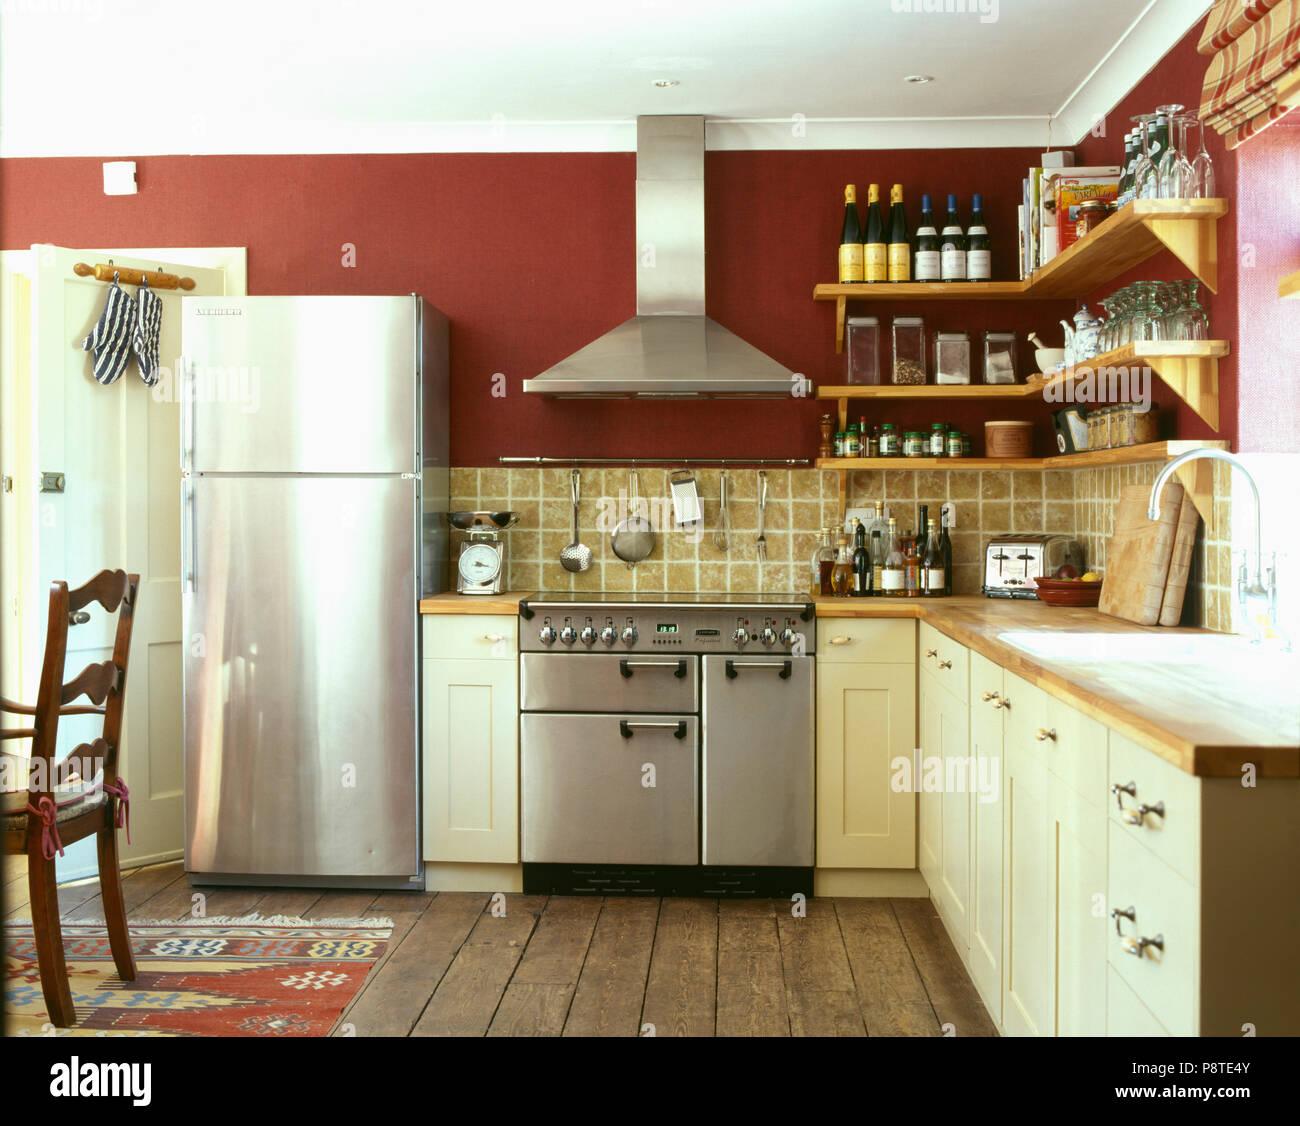 Stainless-steel fridge-freezer and range oven in modern red ...